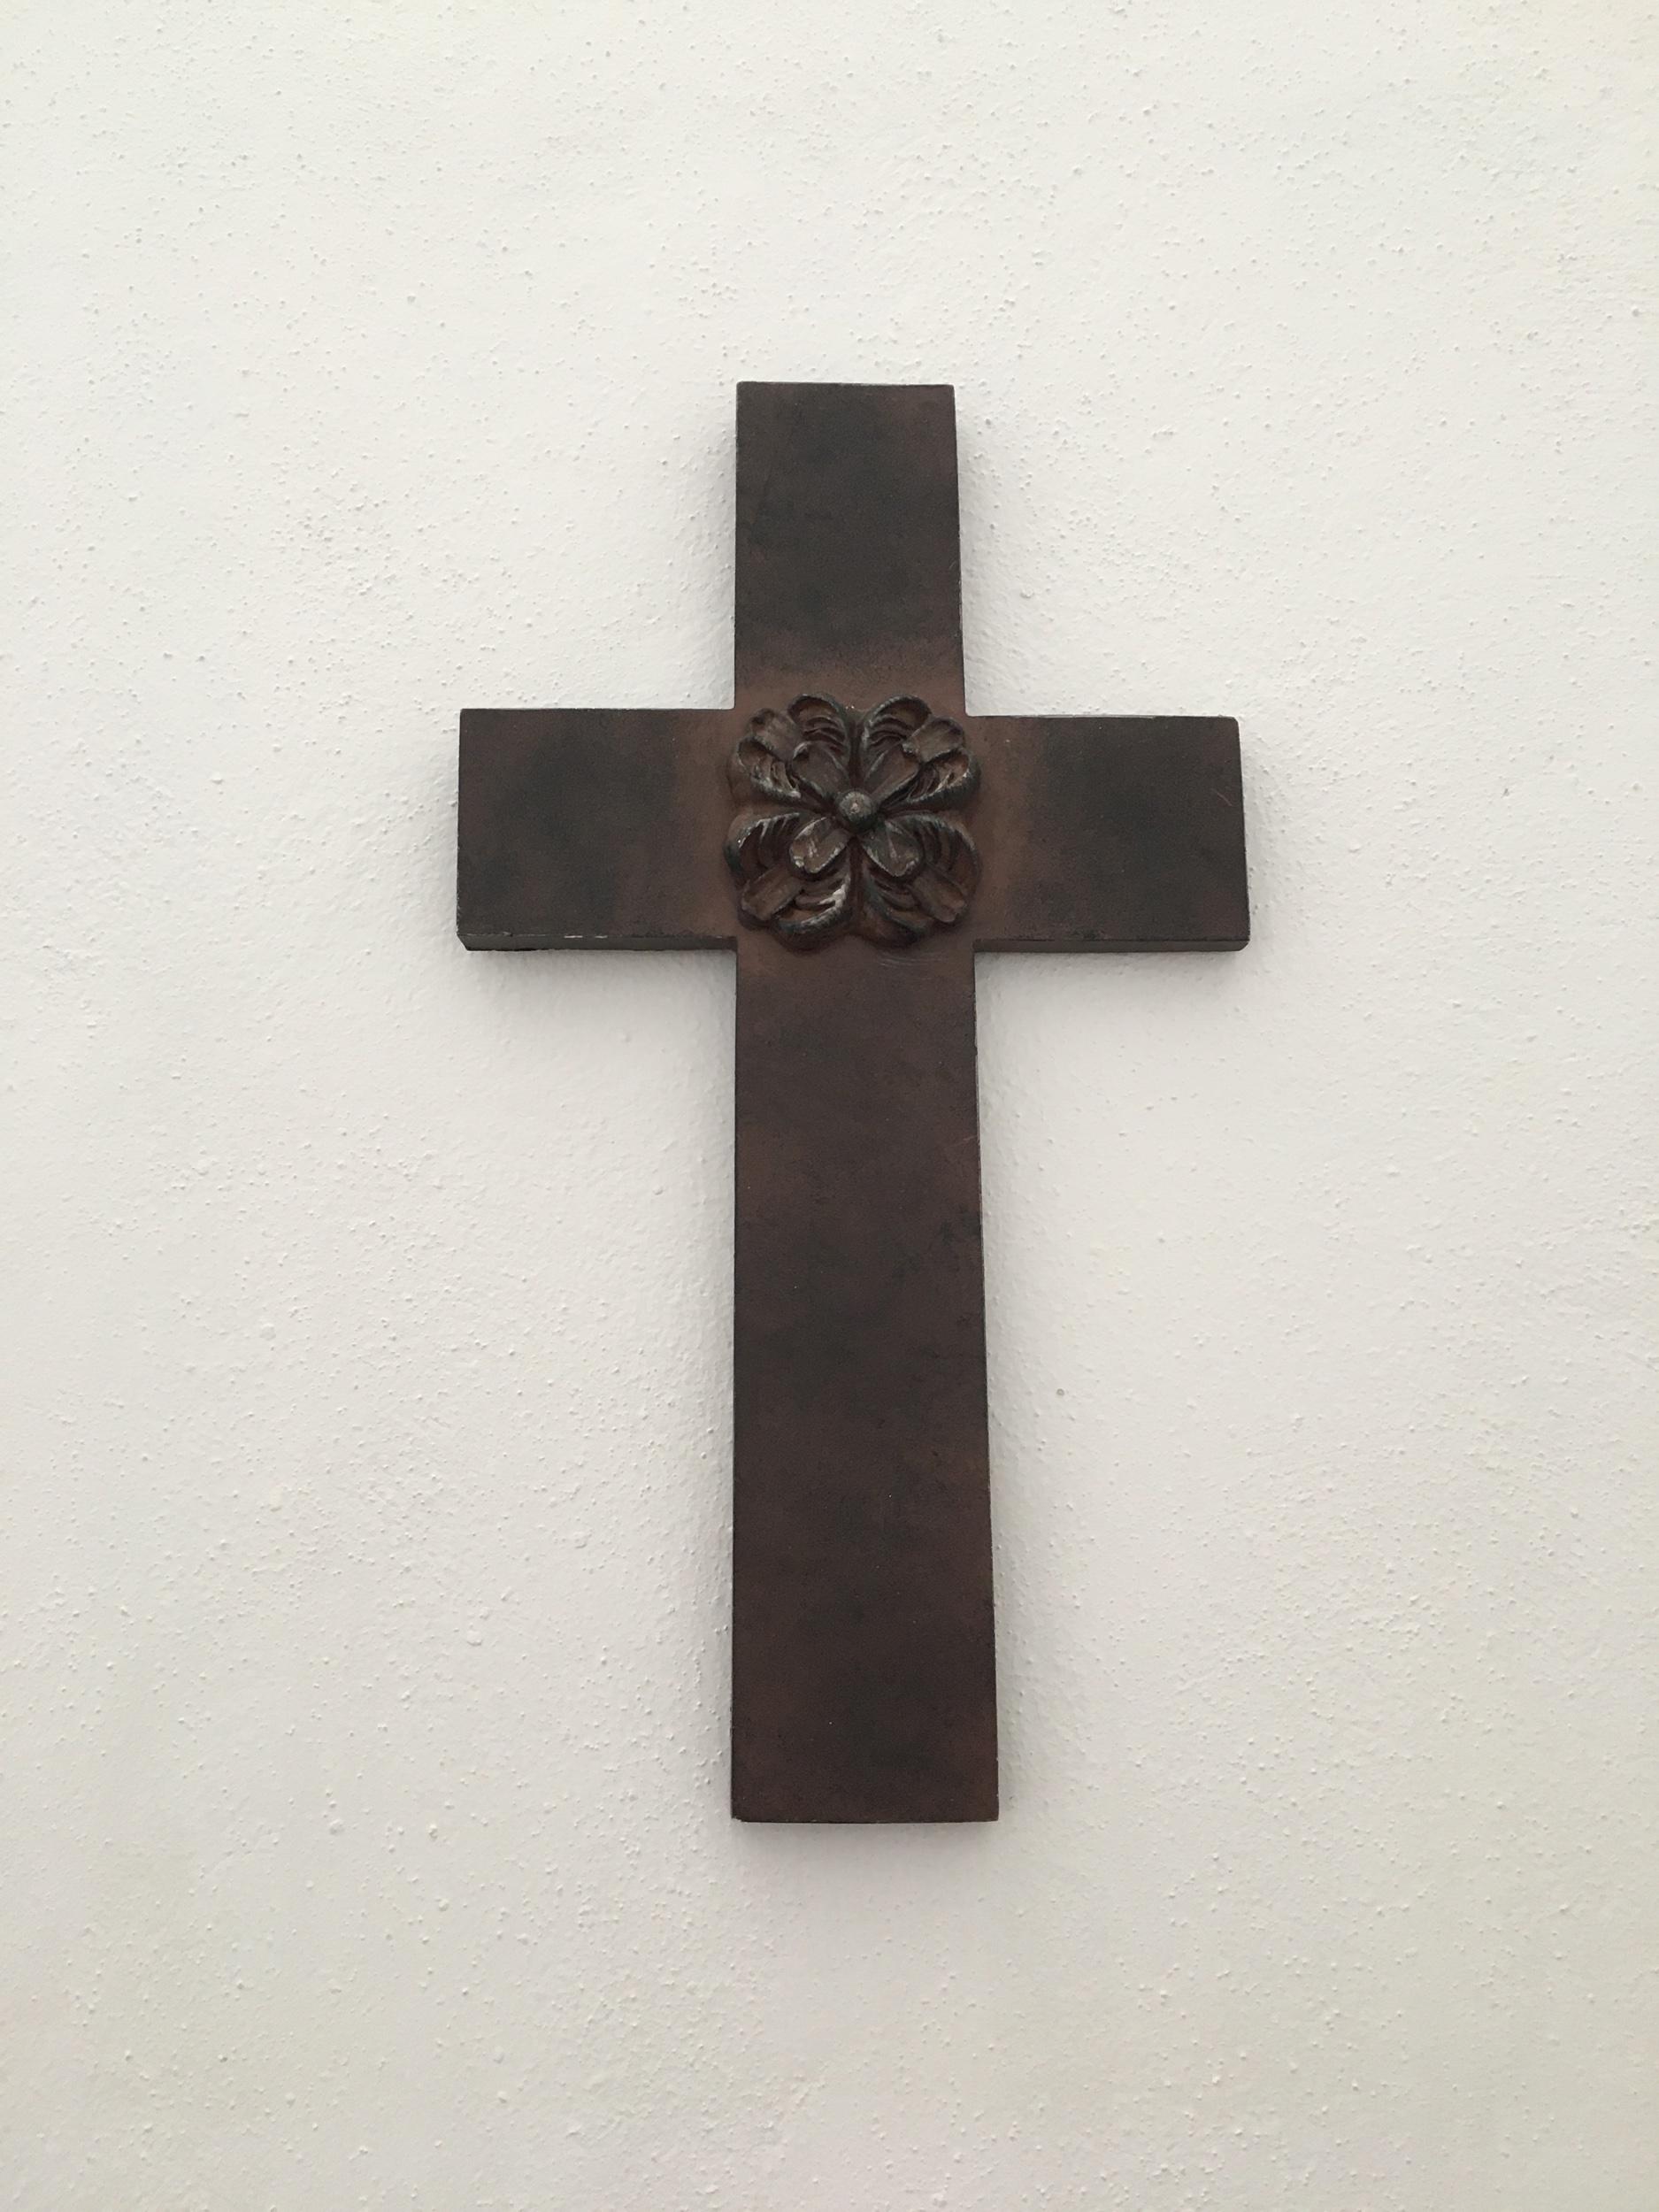 Carry Your Cross Like Jesus